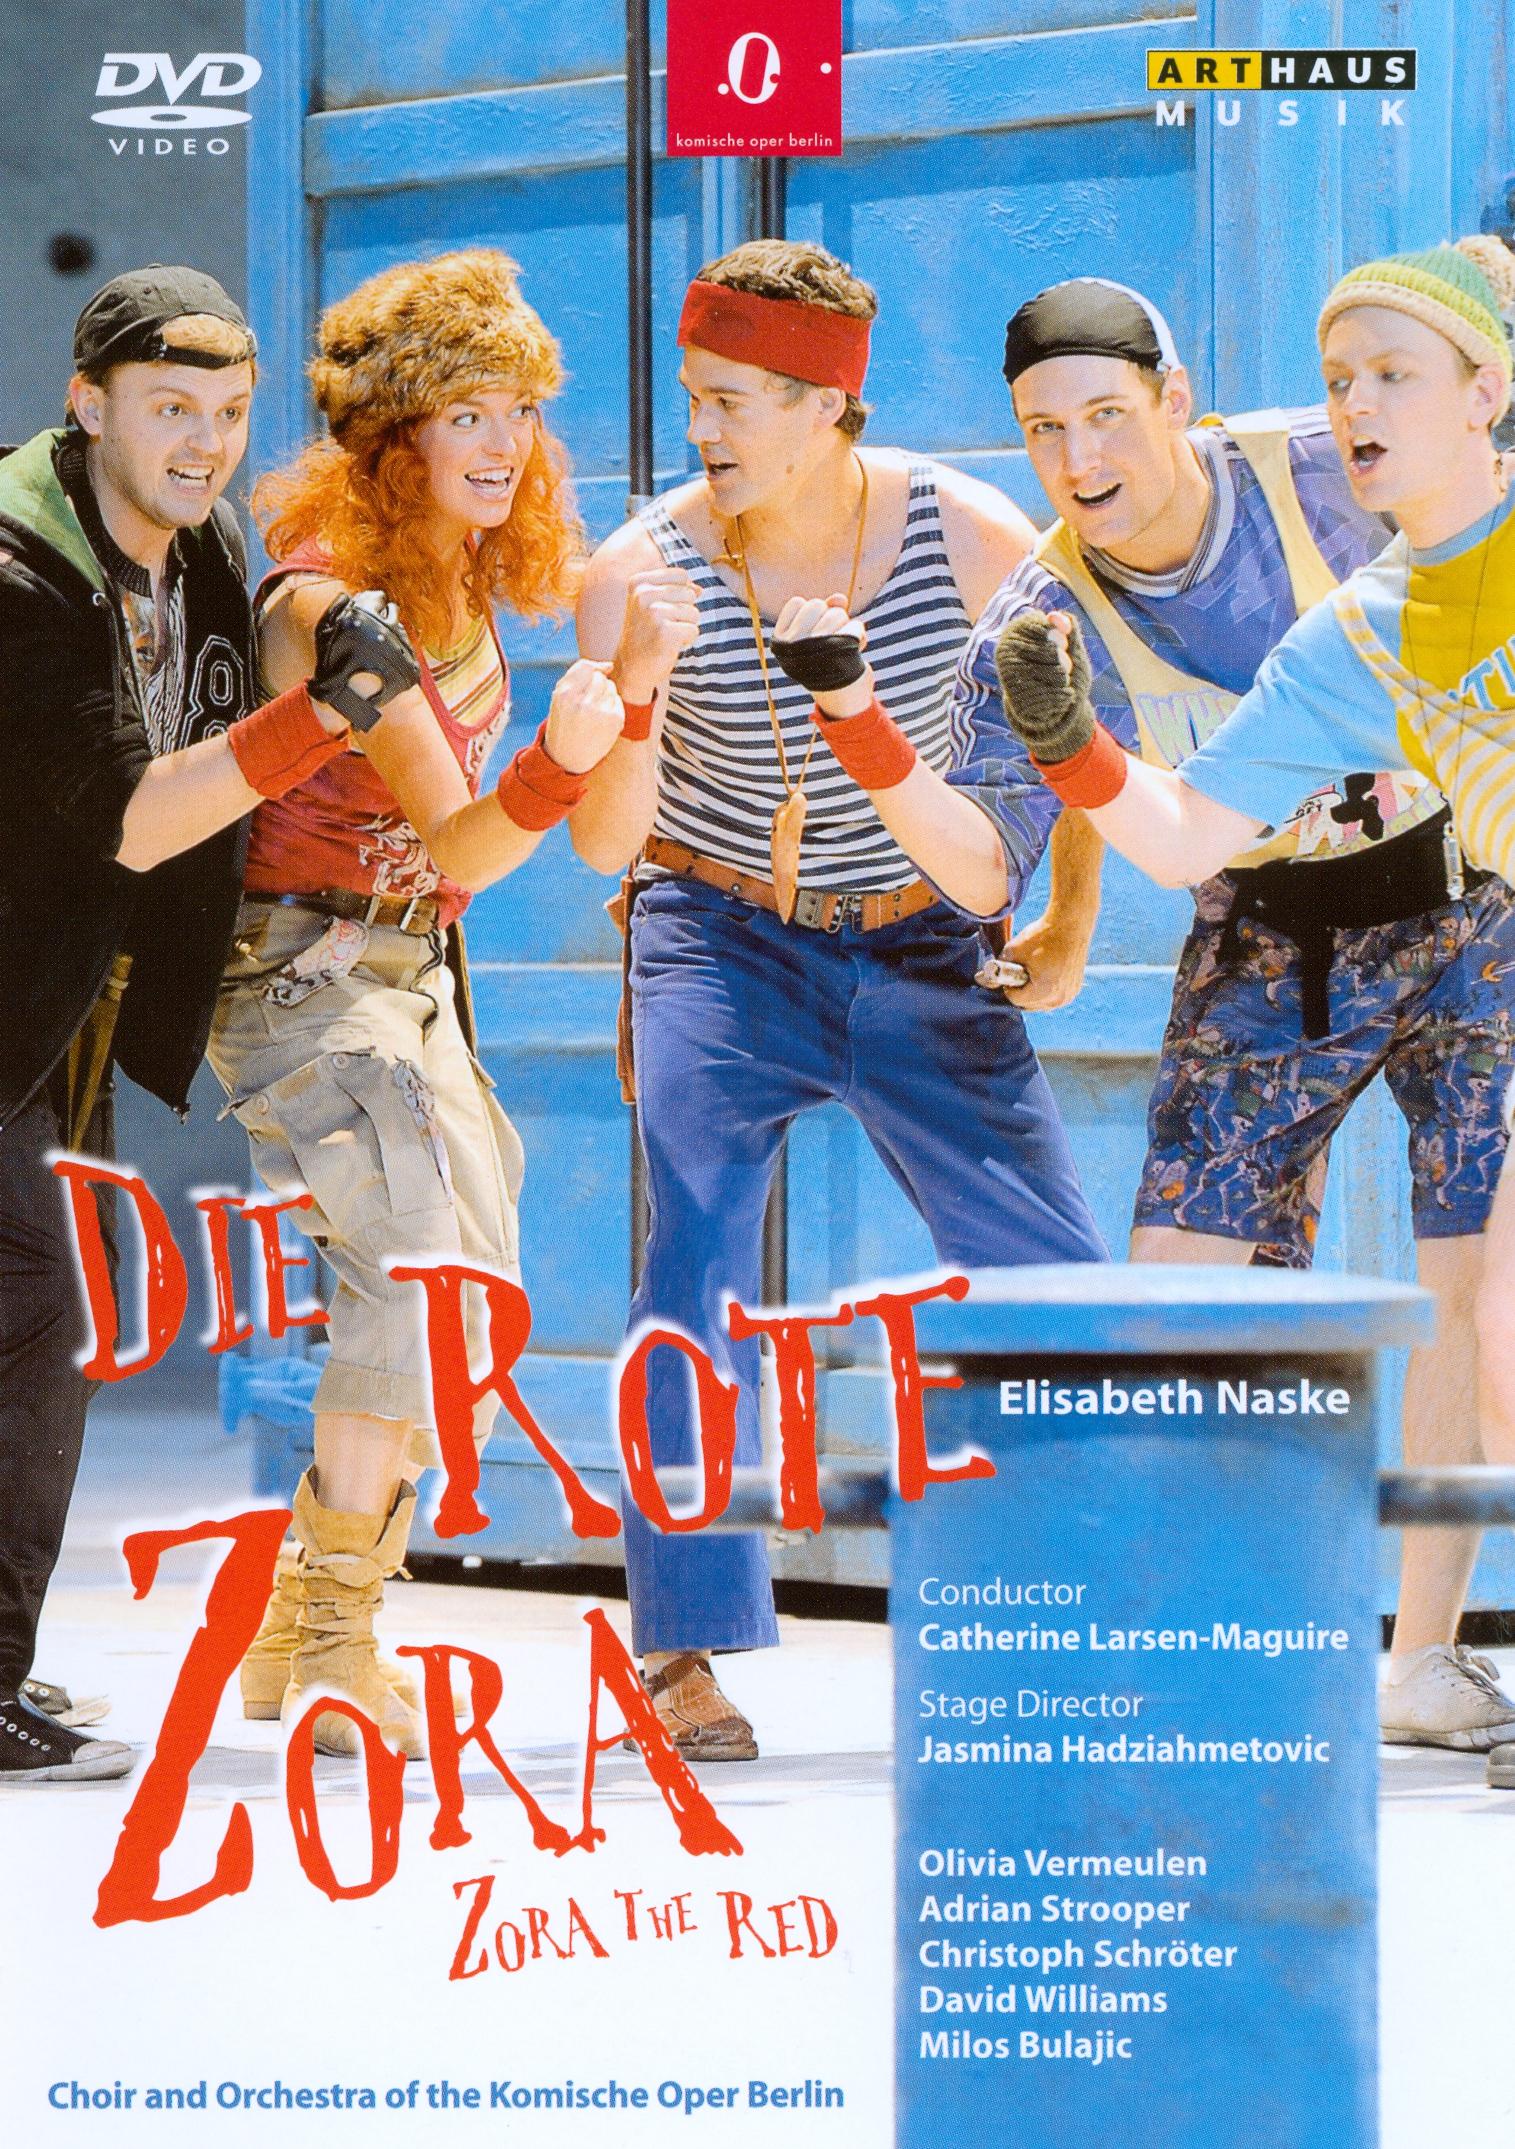 Die Rote Zora (Komische Oper Berlin)